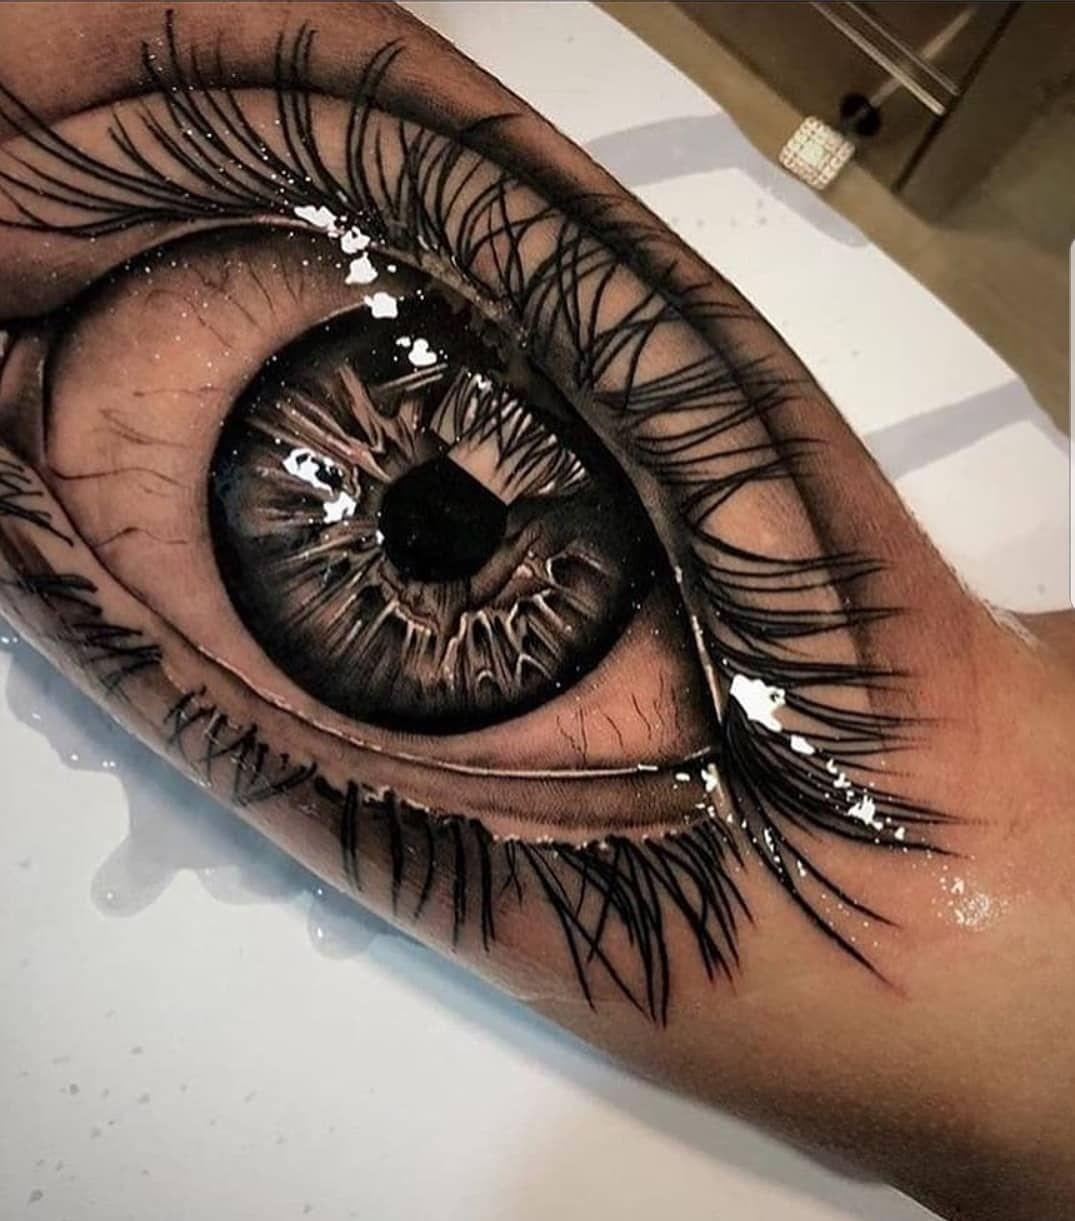 Eye For An Eye Tattoo (6)